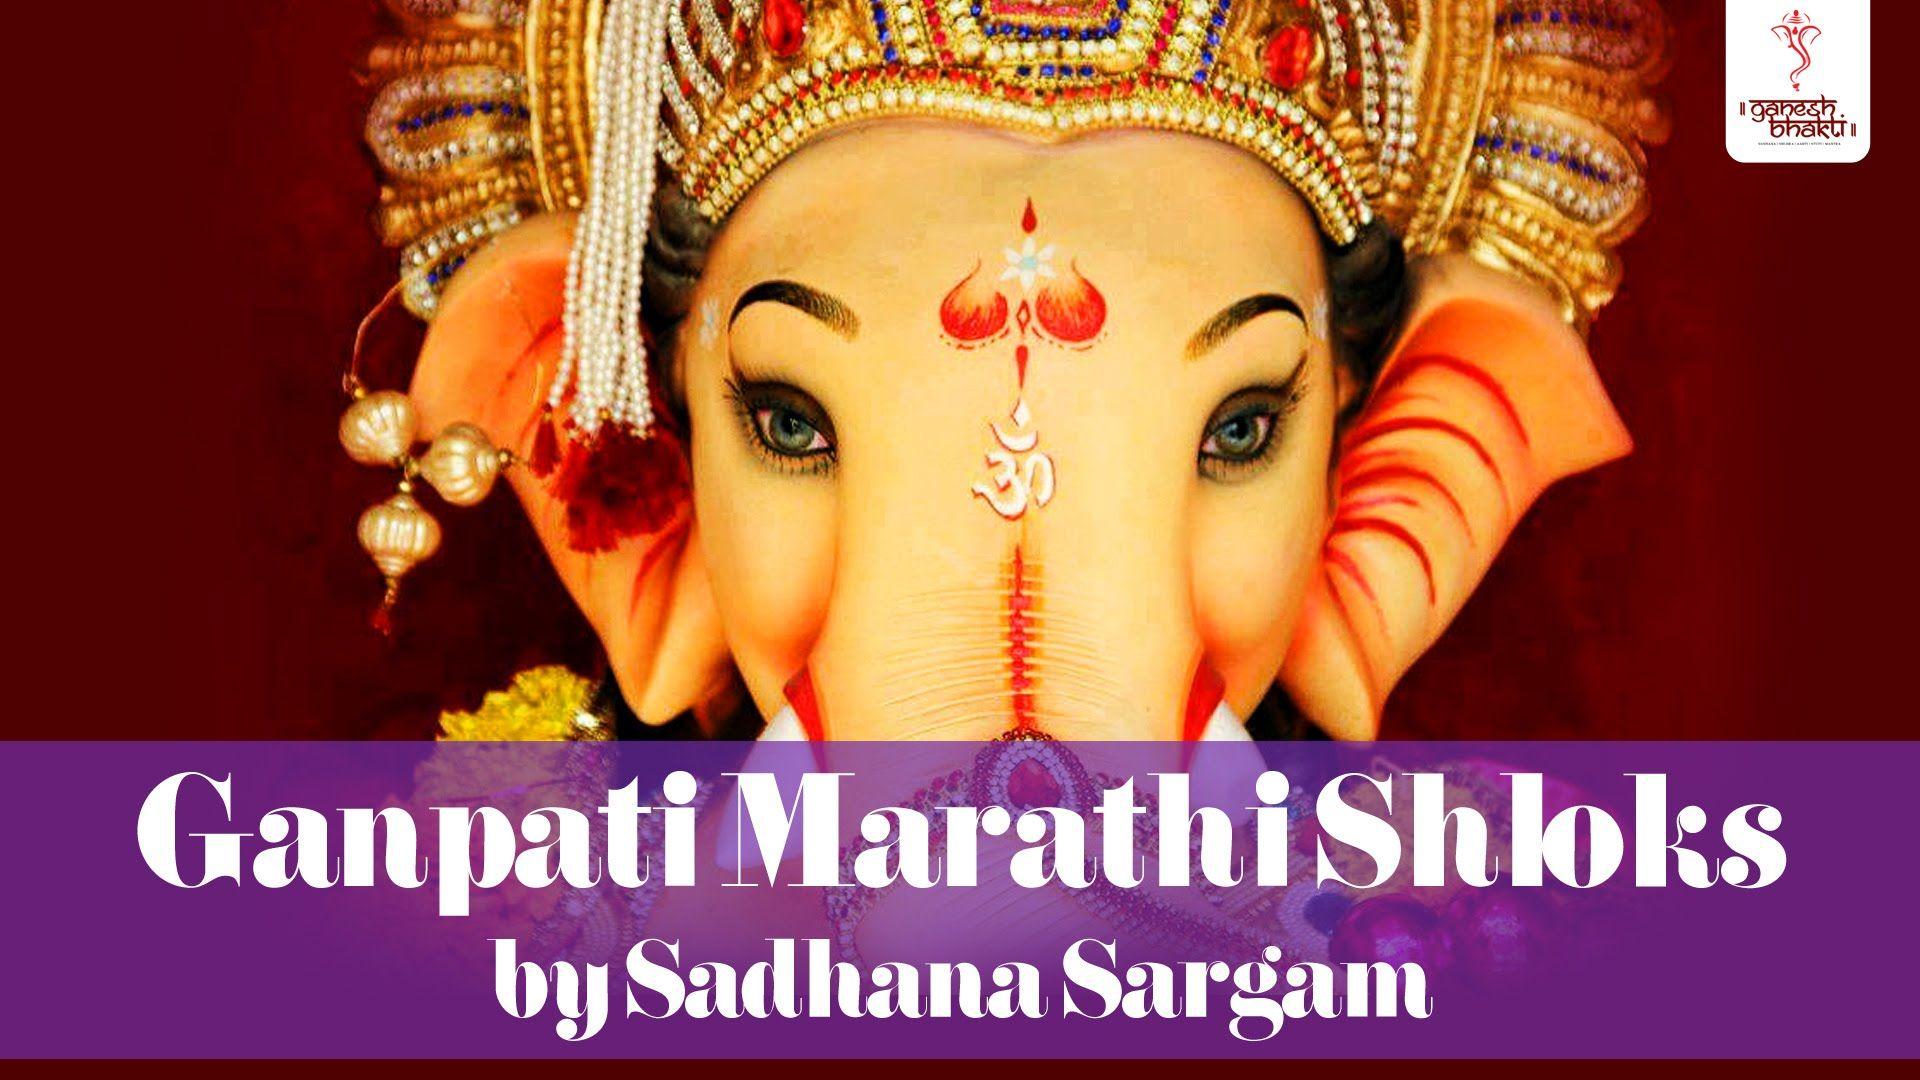 Shri Ganesh Mantra Marathi Shlok || Stotra Sumnajali